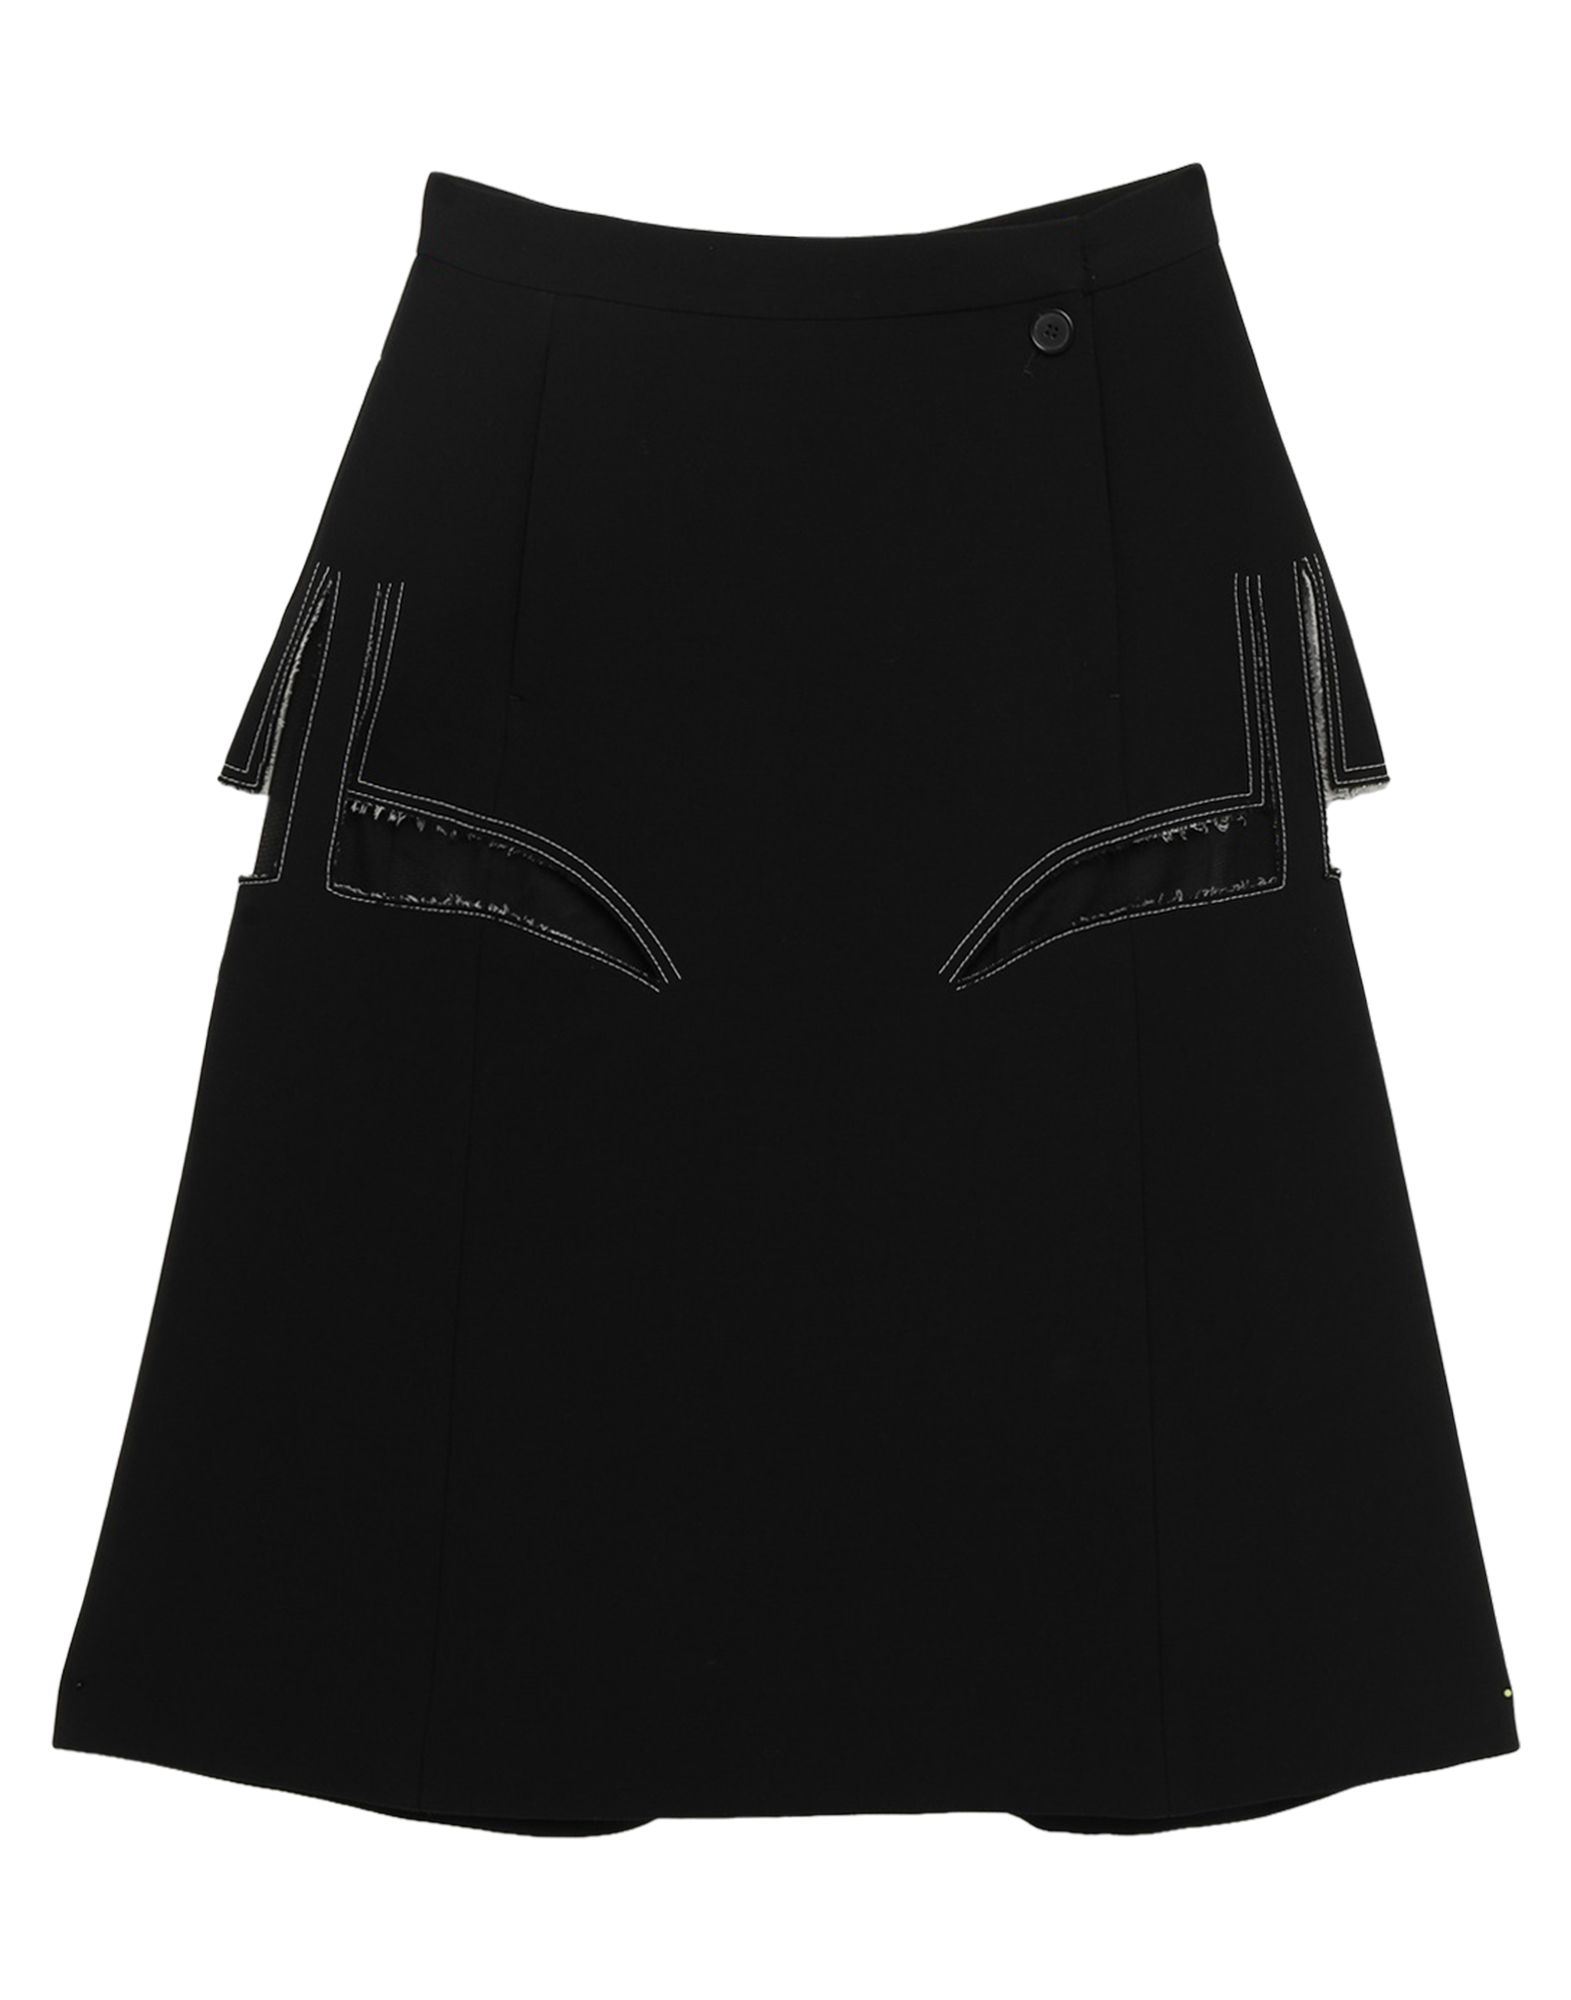 MAISON MARGIELA Юбка длиной 3/4 maison margiela юбка длиной 3 4